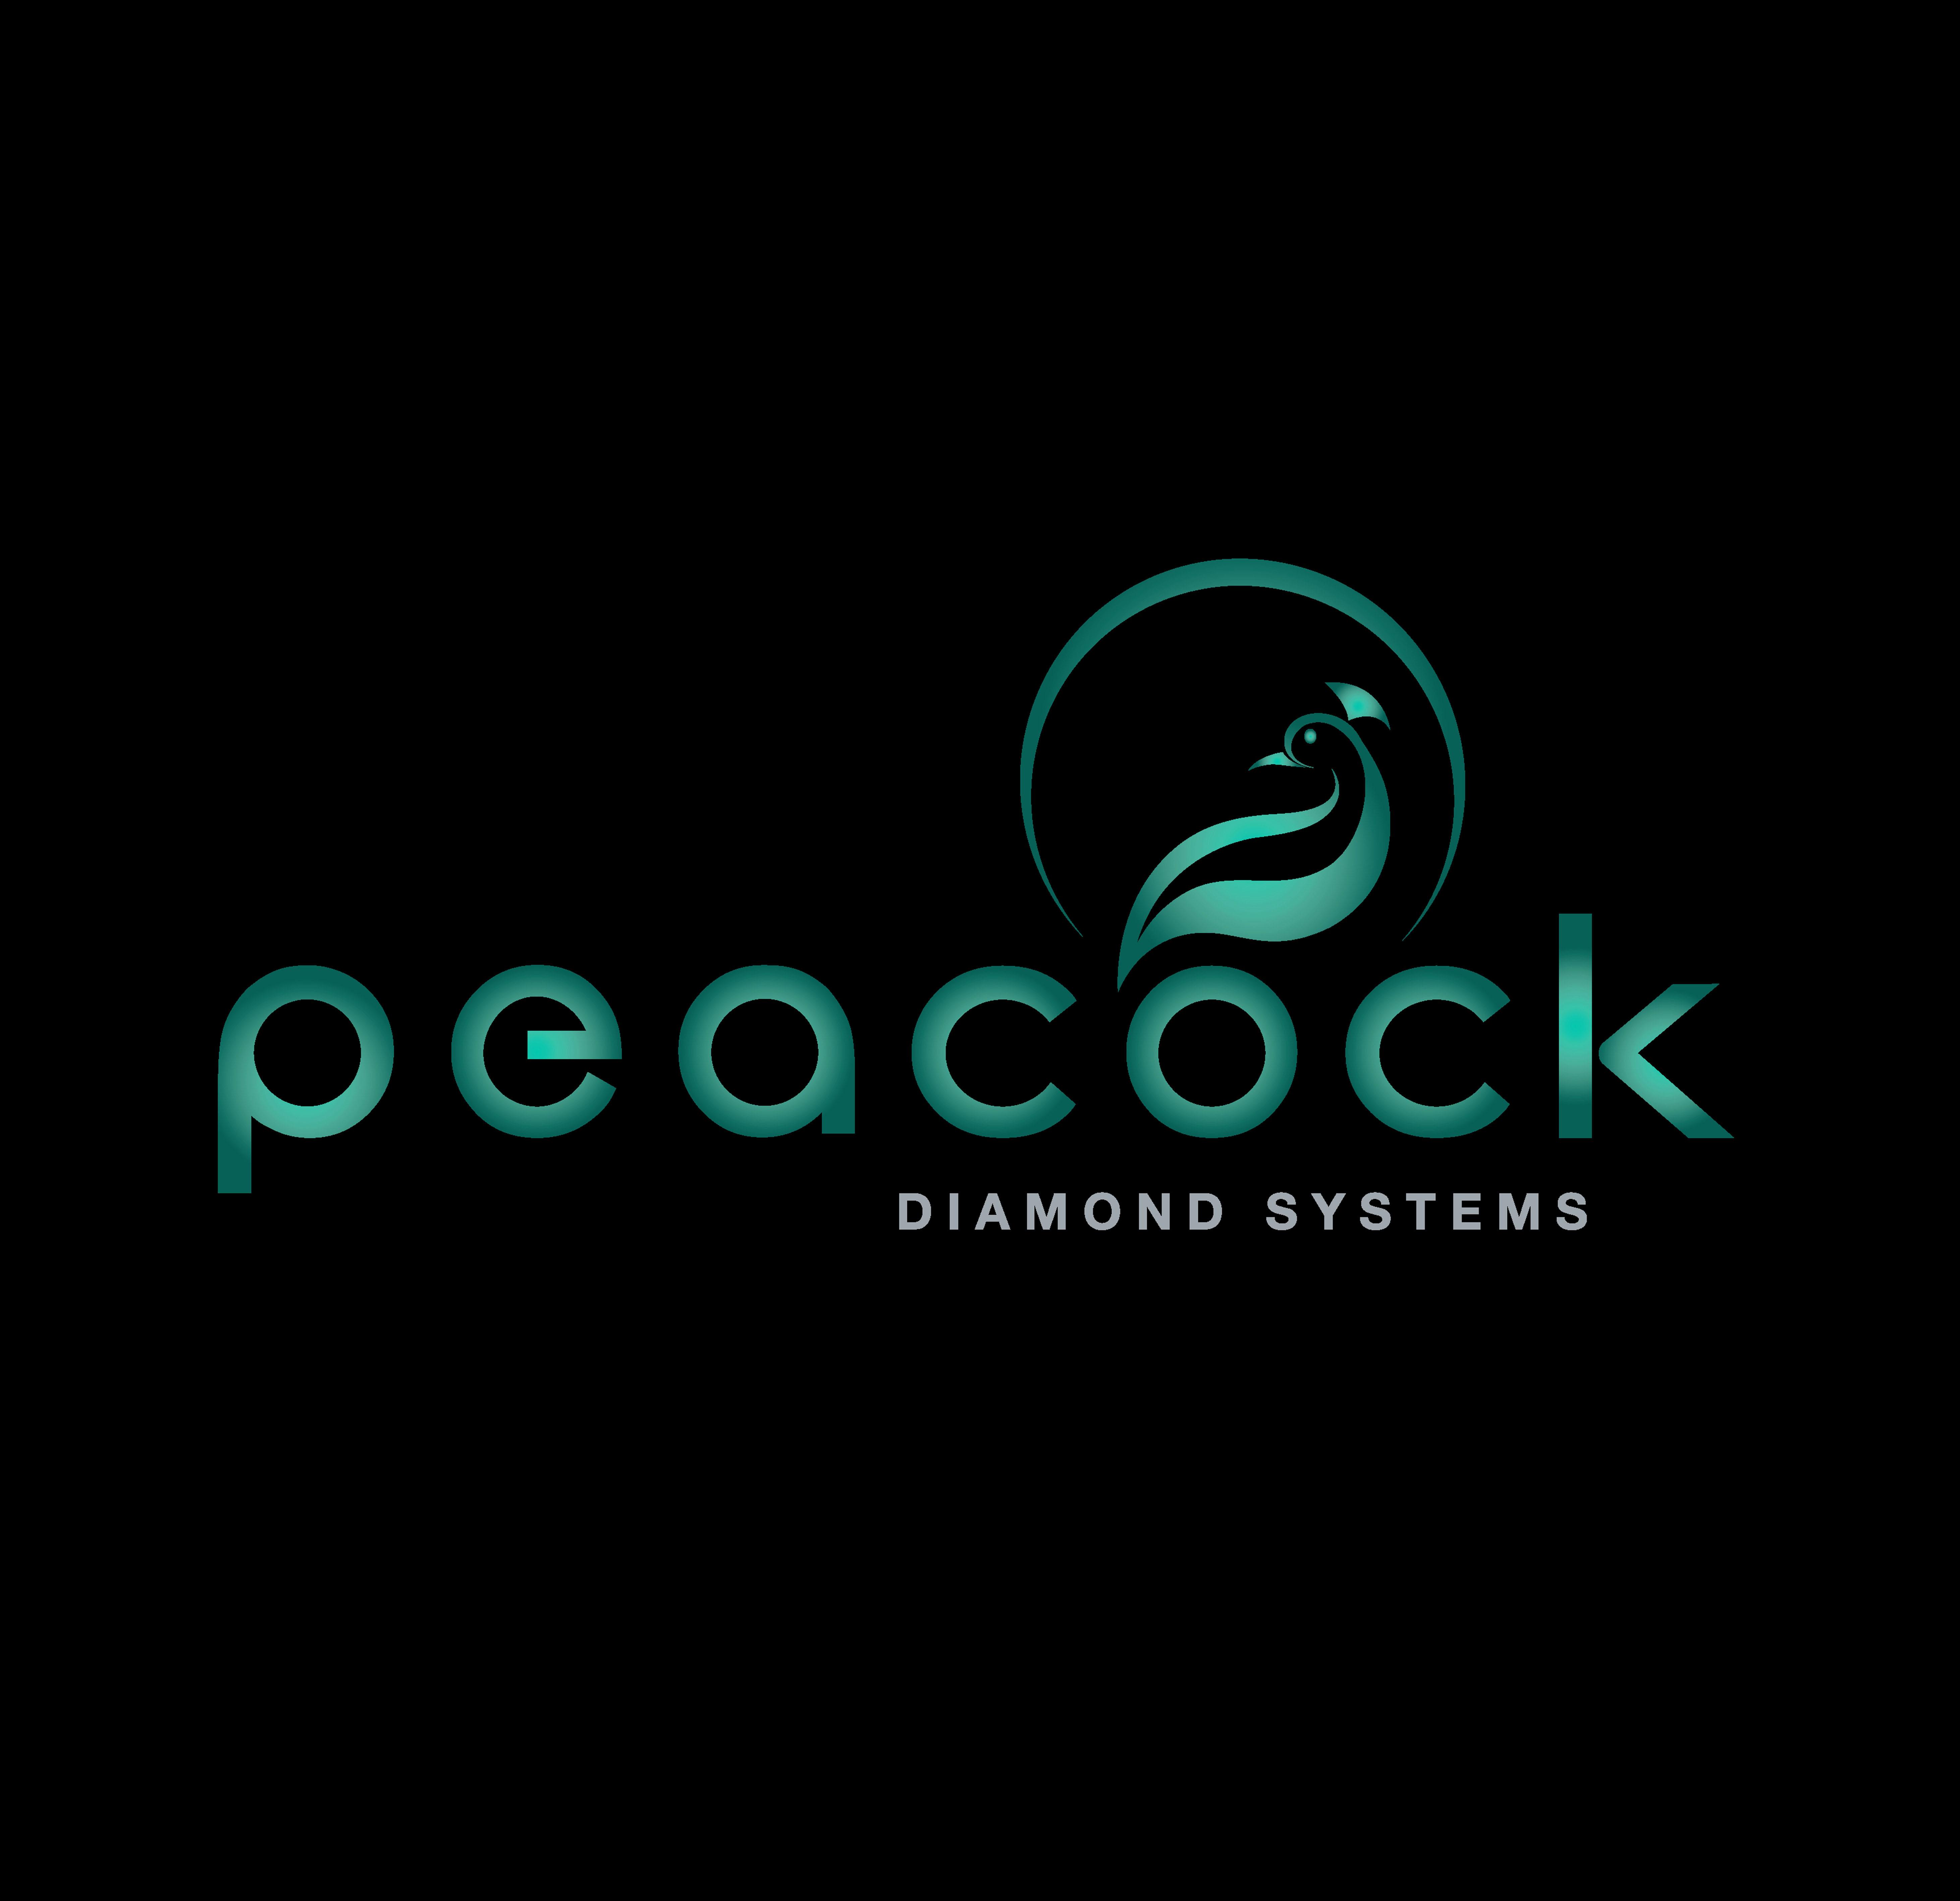 PACCOCK-LOGO-1